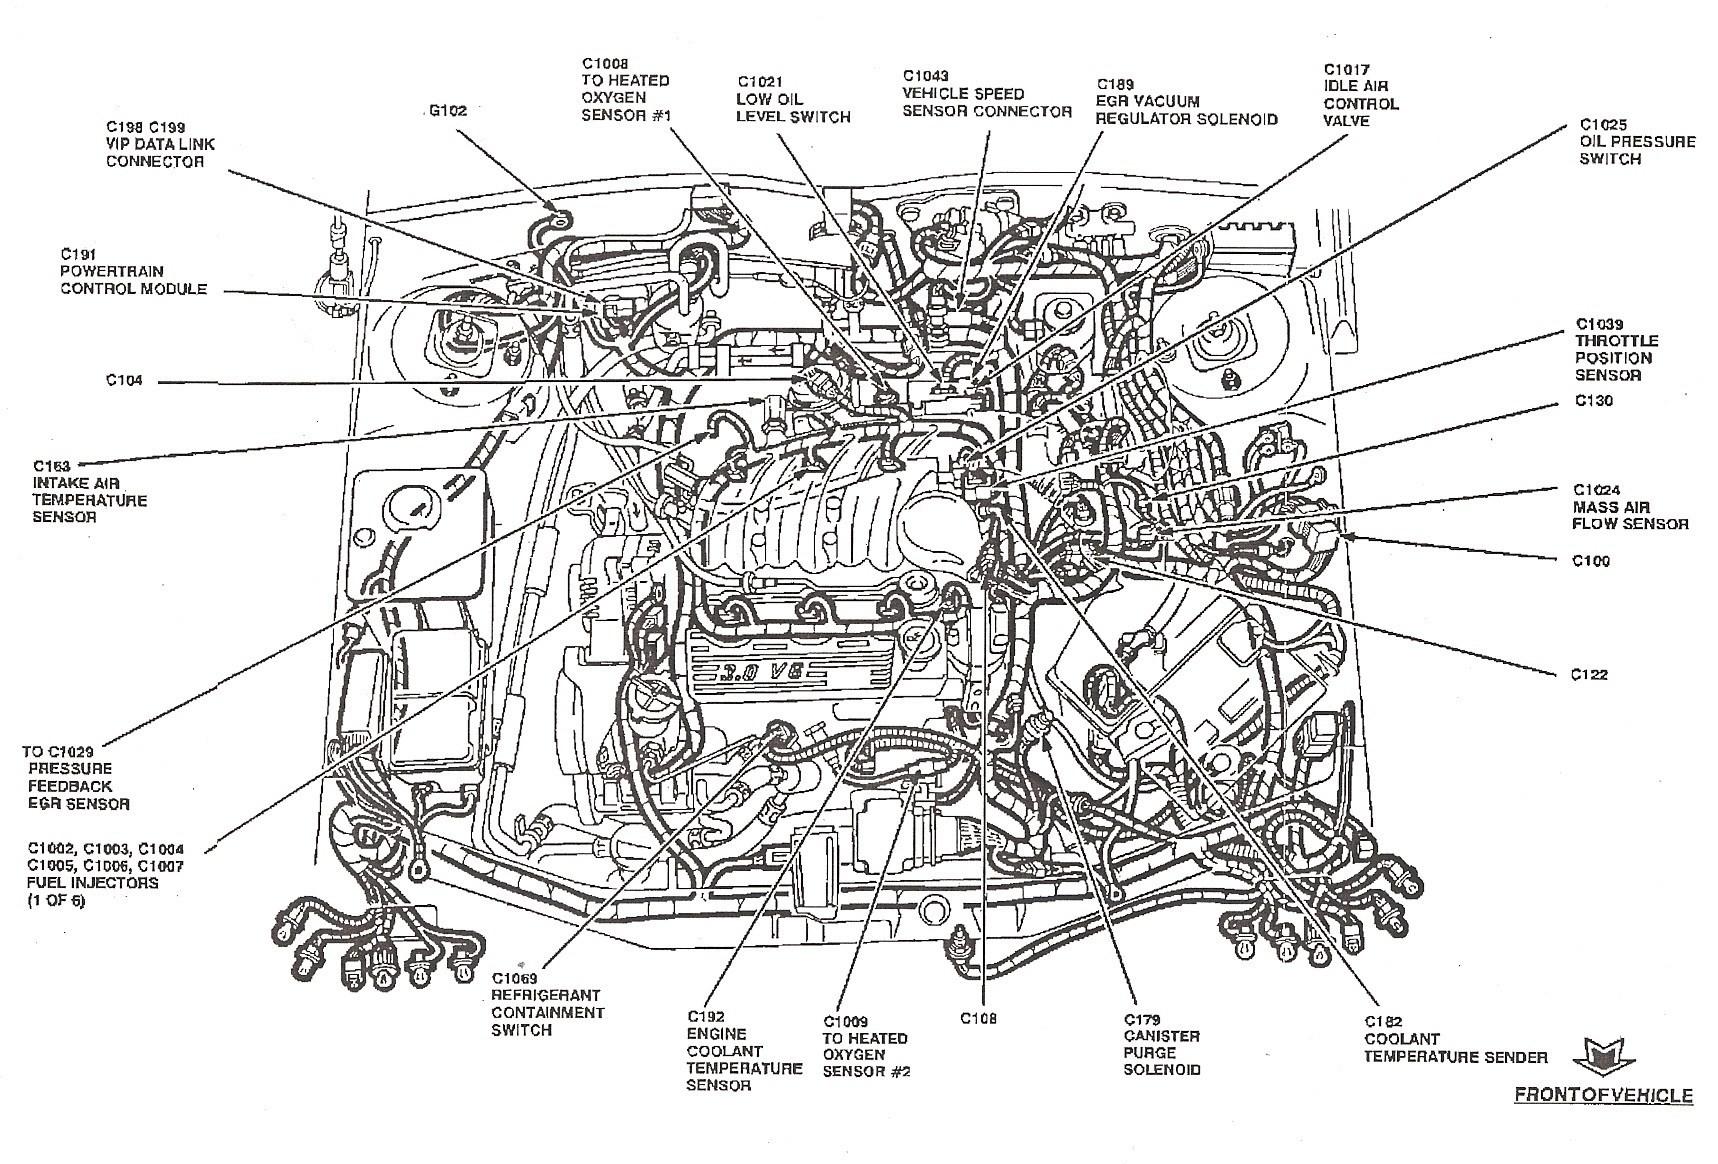 2001 ford F150 Engine Diagram Fuel Line Diagram ford Taurus Fuel Line Diagram ford F150 Fuel Of 2001 ford F150 Engine Diagram